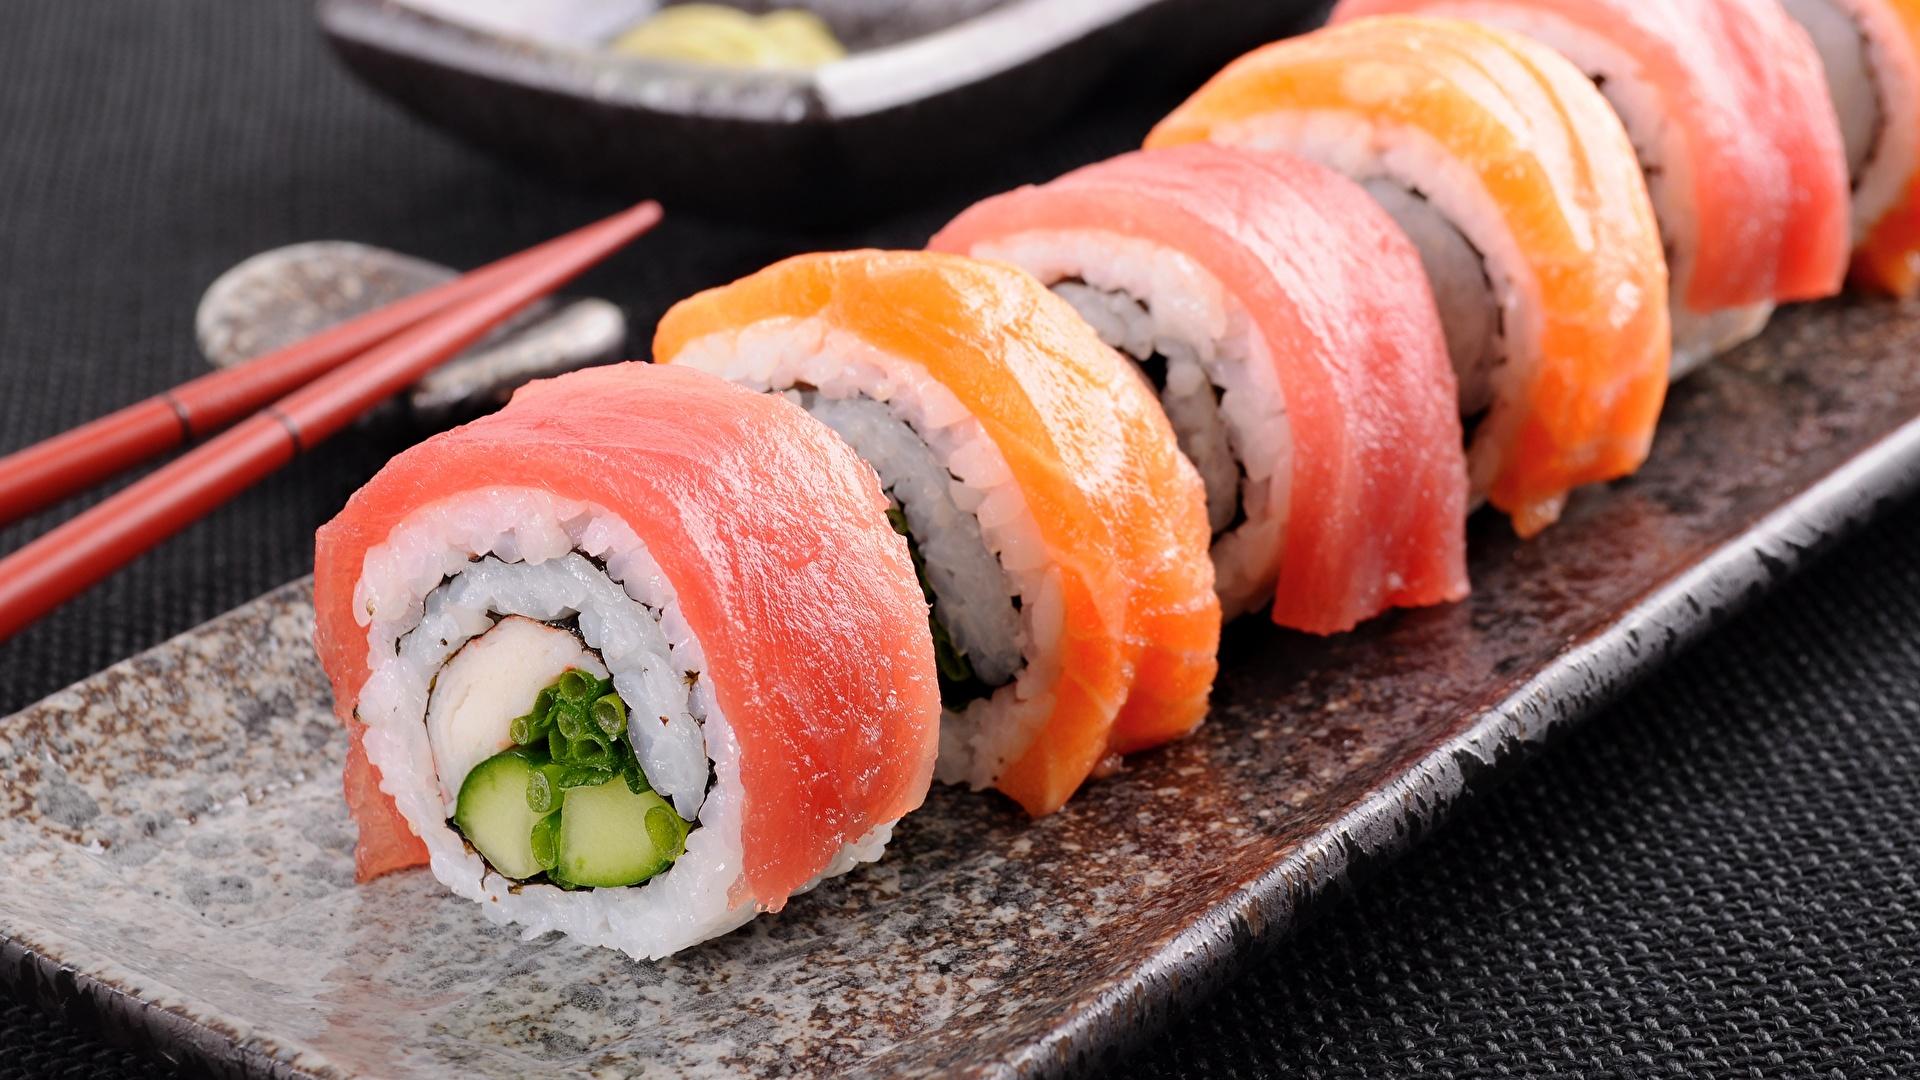 Desktop Wallpapers Sushi Fish - Food Food Closeup 1920x1080